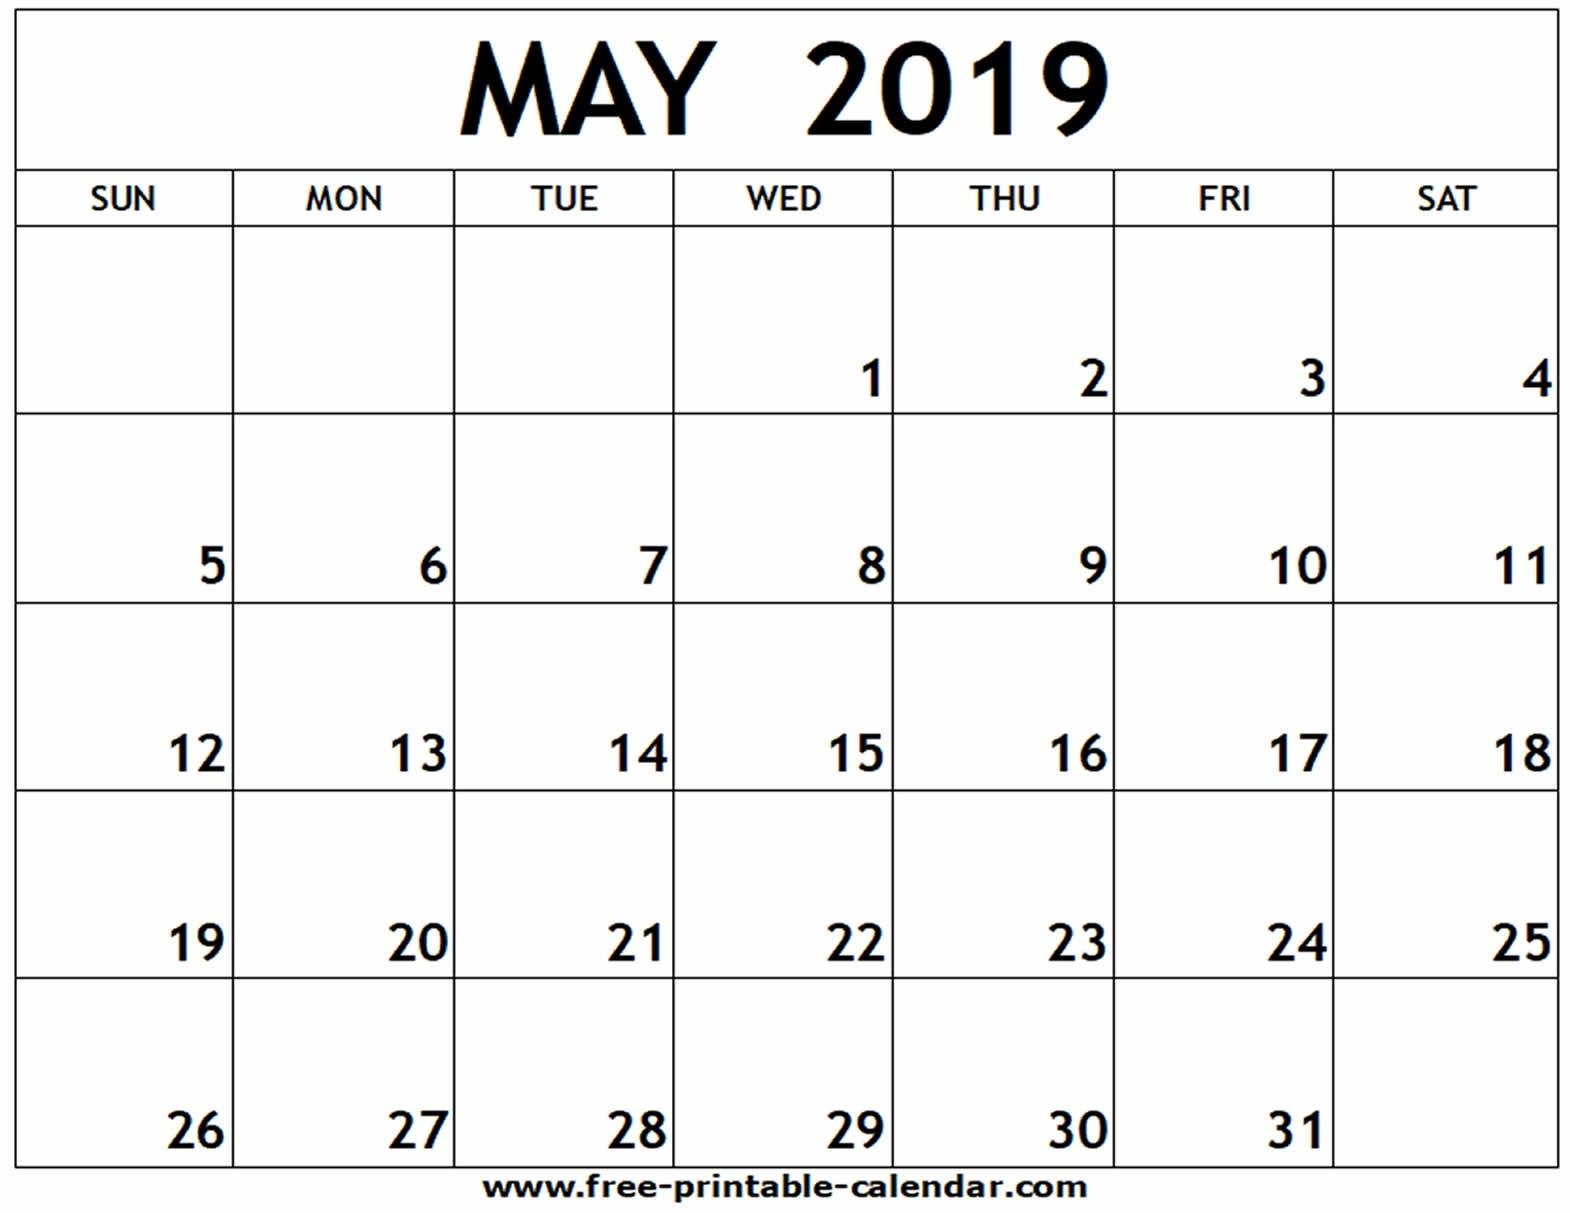 Free Printable Calandars Calendars 2018-19 2018 Australia